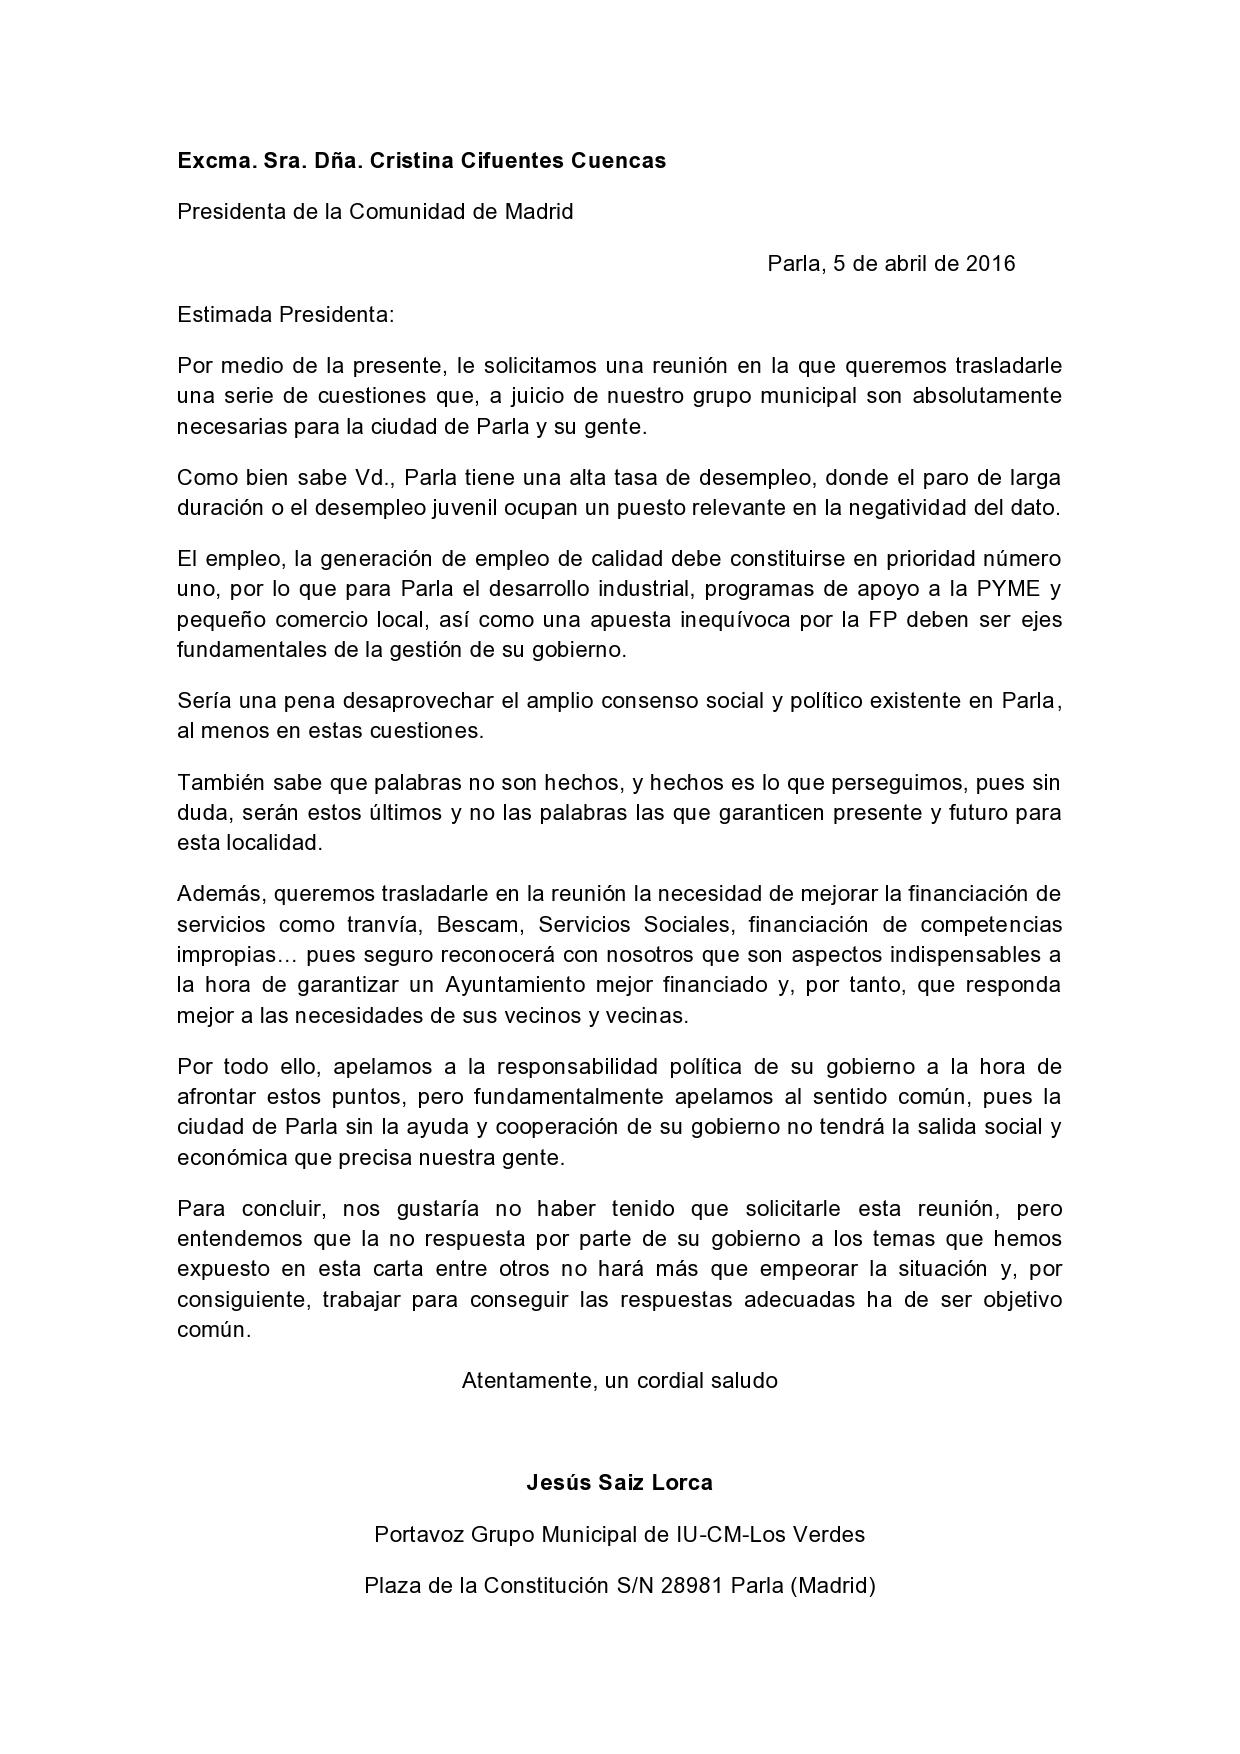 Carta de IU